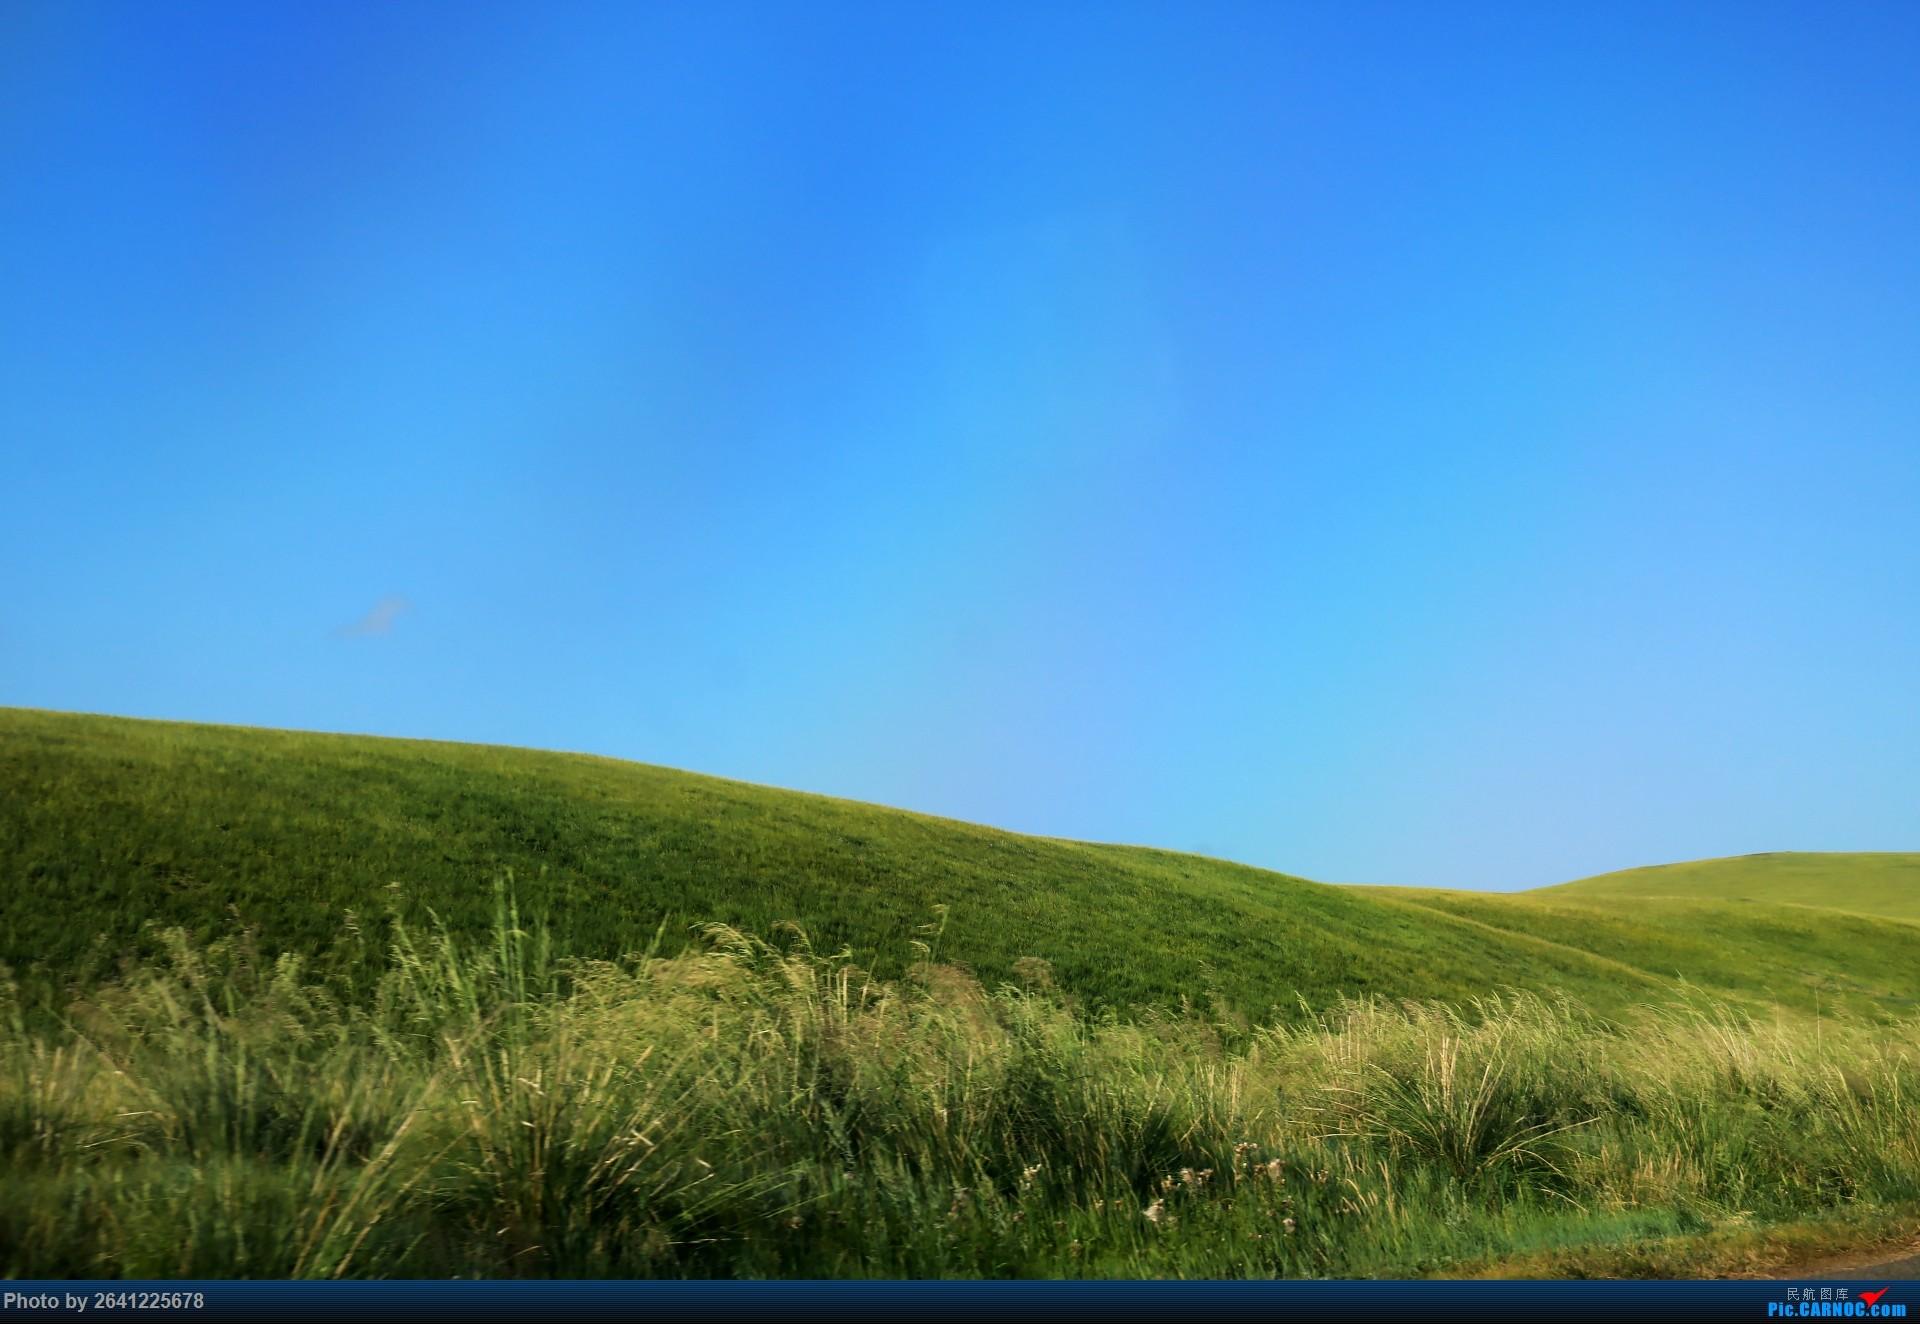 Re:[原创]【小周游记第3集】草原茫茫天地间,洁白的蒙古包散落在河边——内蒙古5天4飞半自由行(宽体与支线客机初体验)有flight log和驾驶舱哦 欢迎砸飞机